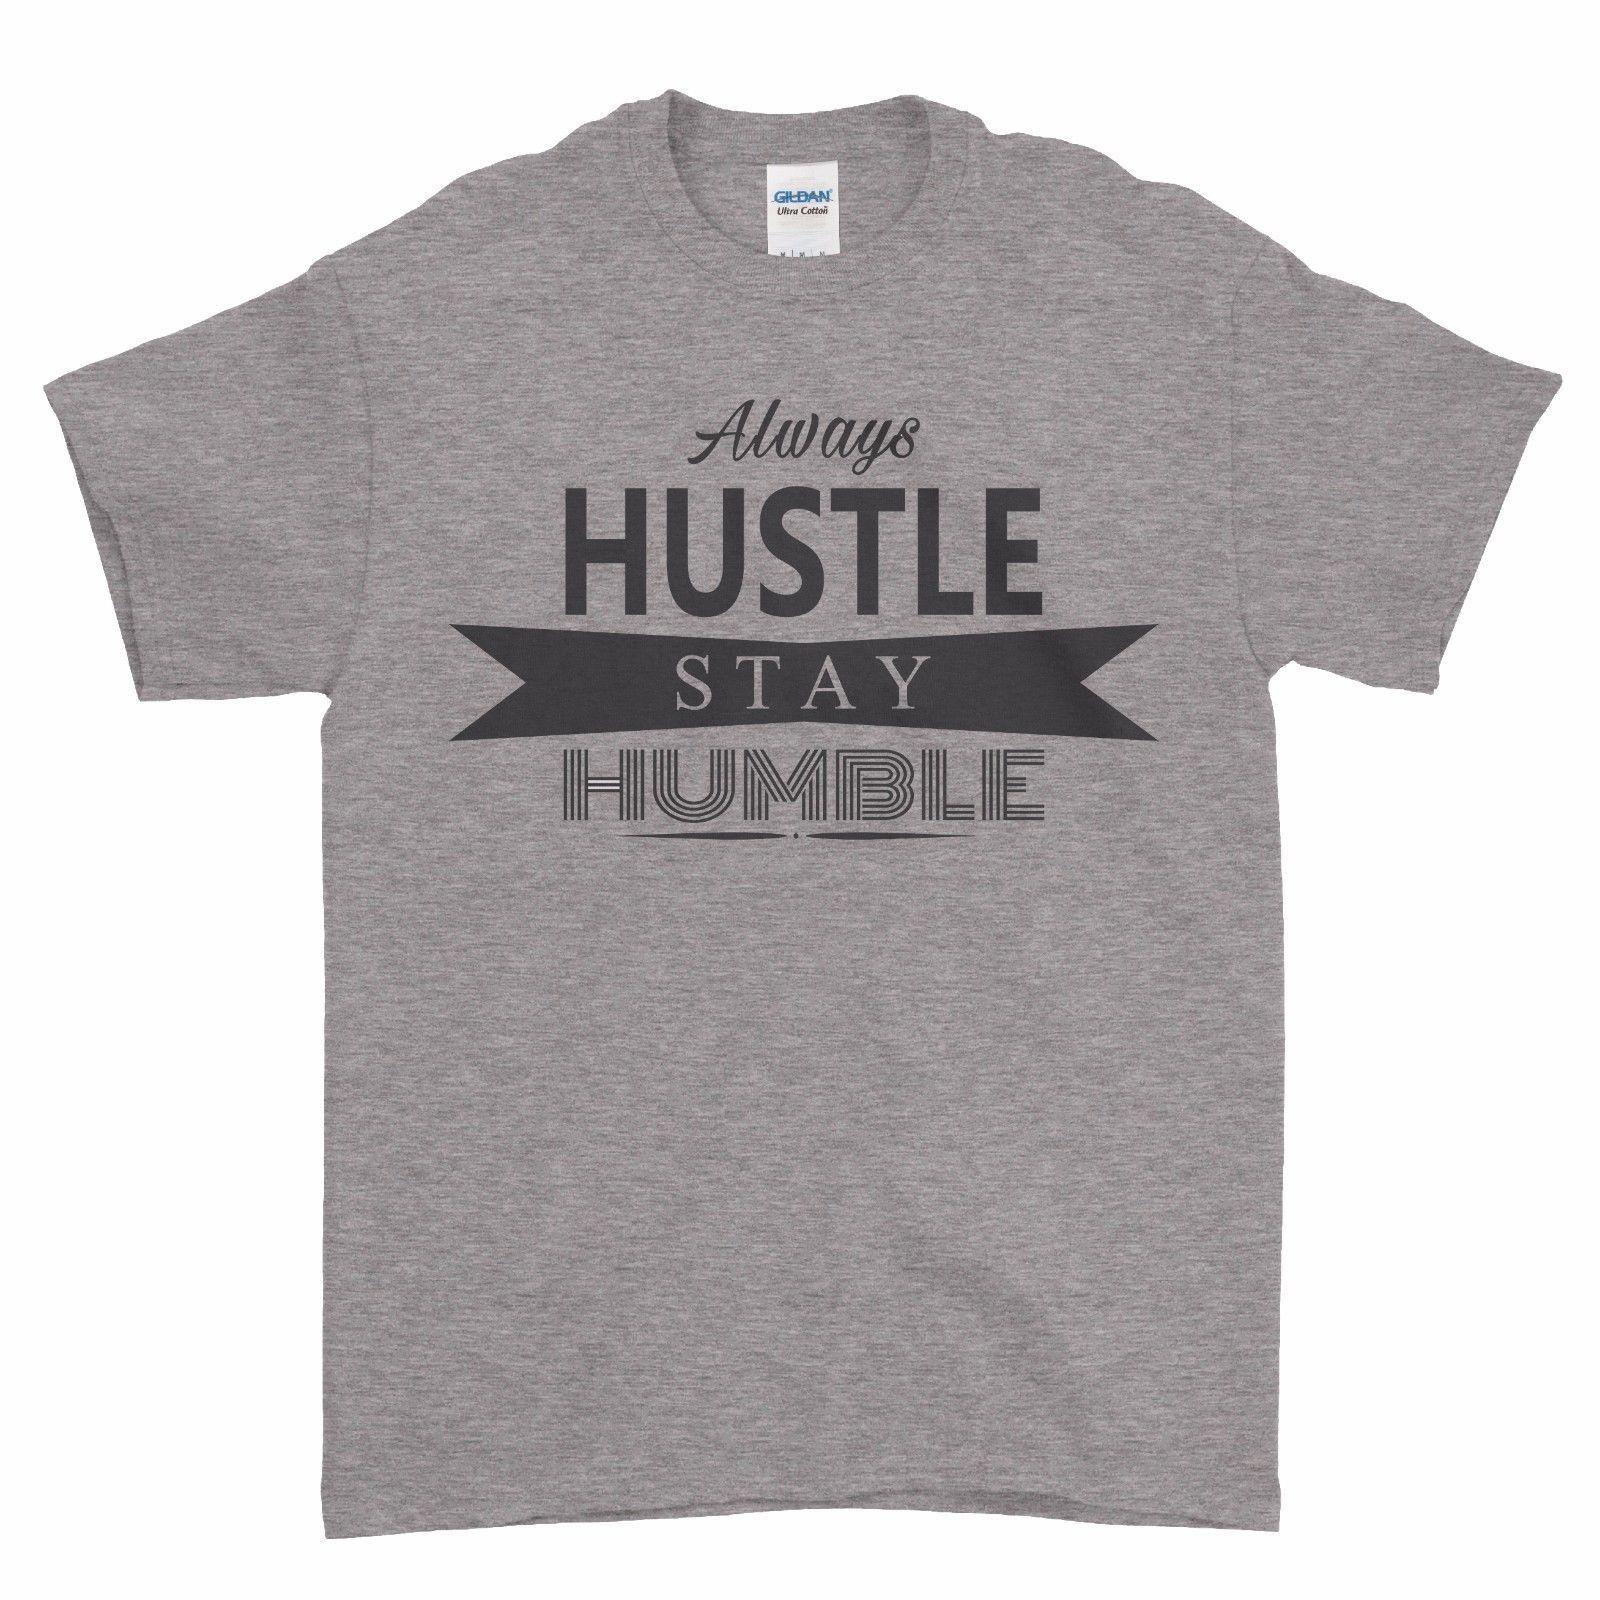 7661aced3 Always Hustle Stay Humble Hard King Big Dream Boys Men T Shirt Tshirt Tee  Cool Casual Pride T Shirt Men Unisex New Fashion Funky Tee Shirts Humor T  Shirt ...